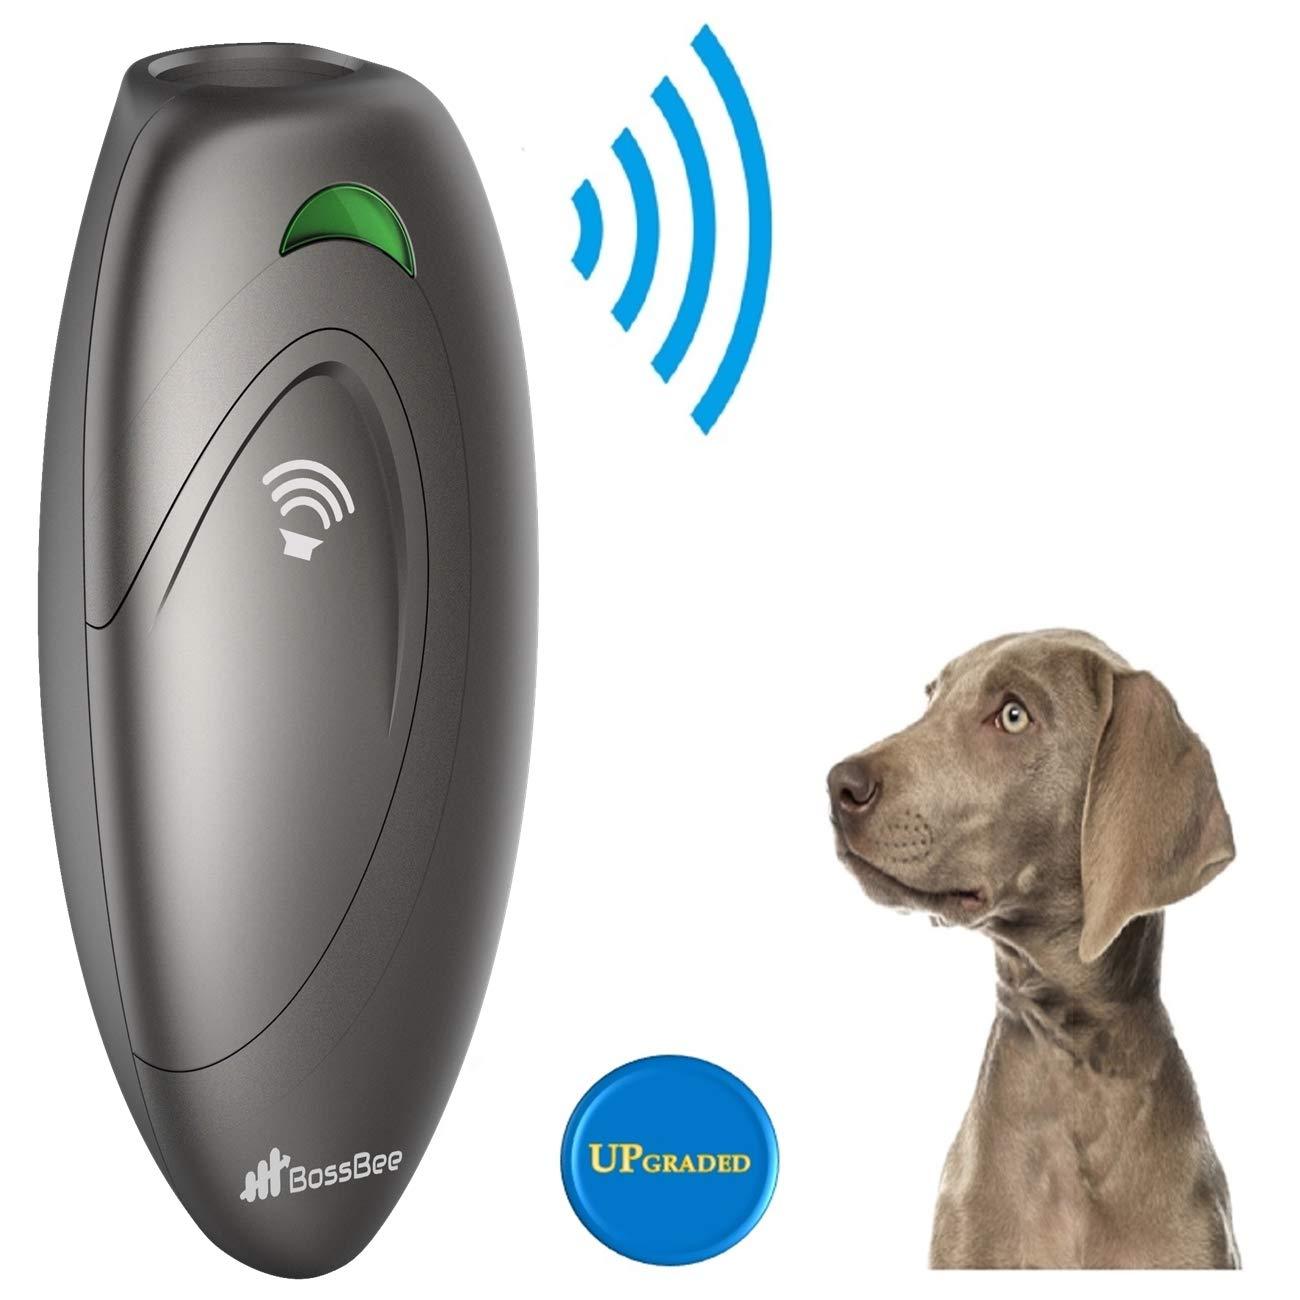 BossBee Ultrasonic barking control, Dog bark control, Bark trainer, Anti barking device, Handheld ultrasonic dog bark deterrent with Wrist Strap,No bark devices,Barking dog deterrent,Bark controller by BossBee